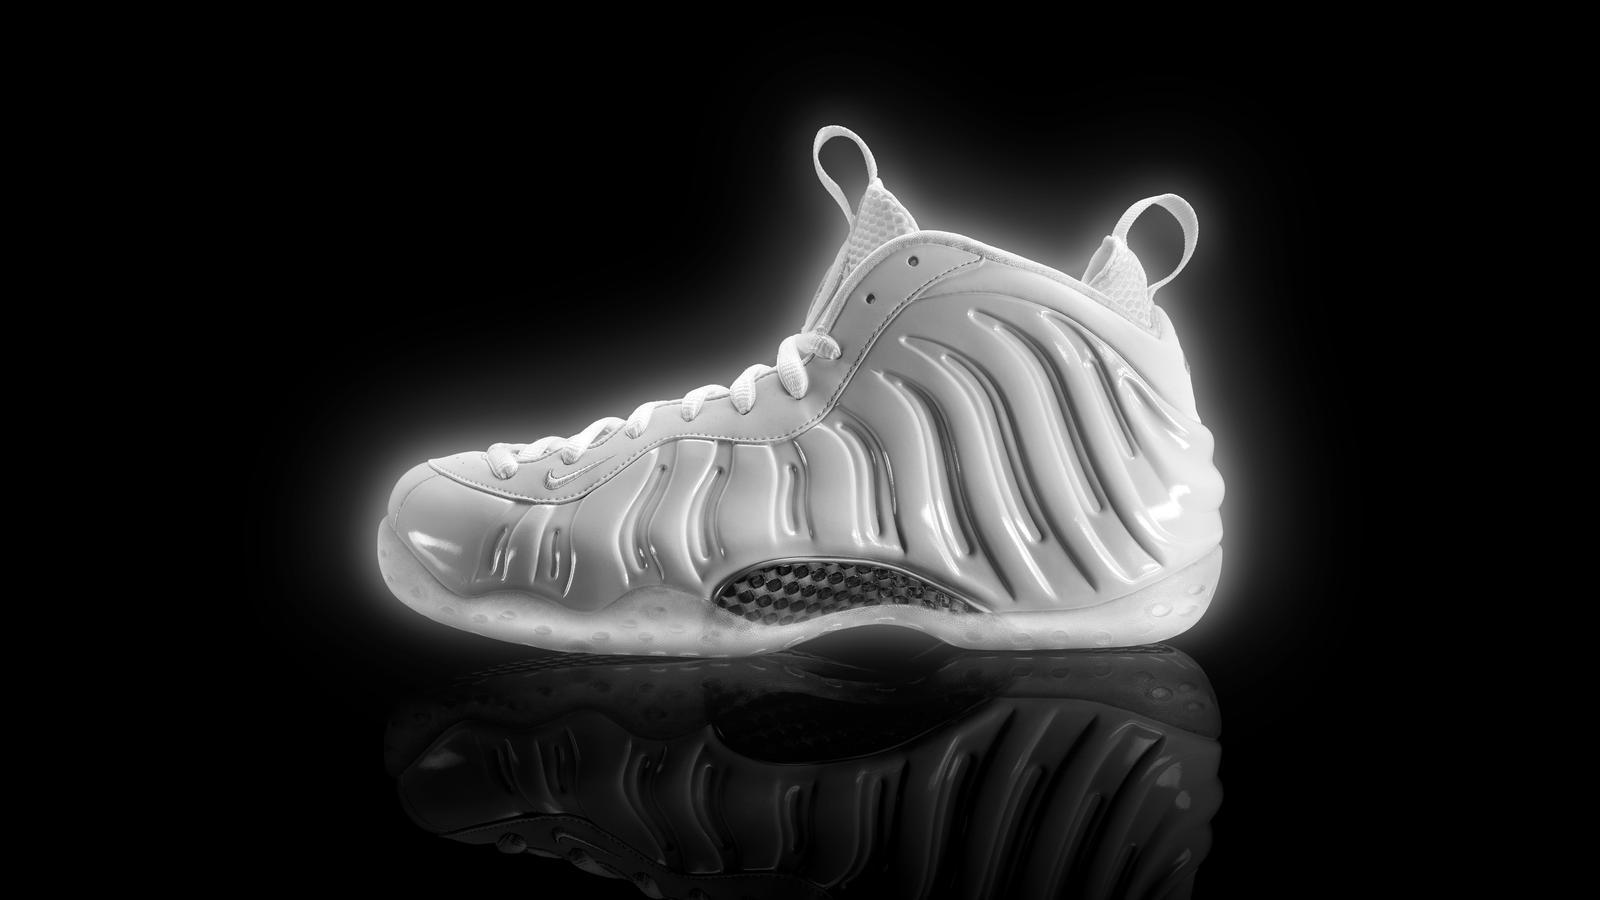 Pure Radiance: White Nike Foamposite